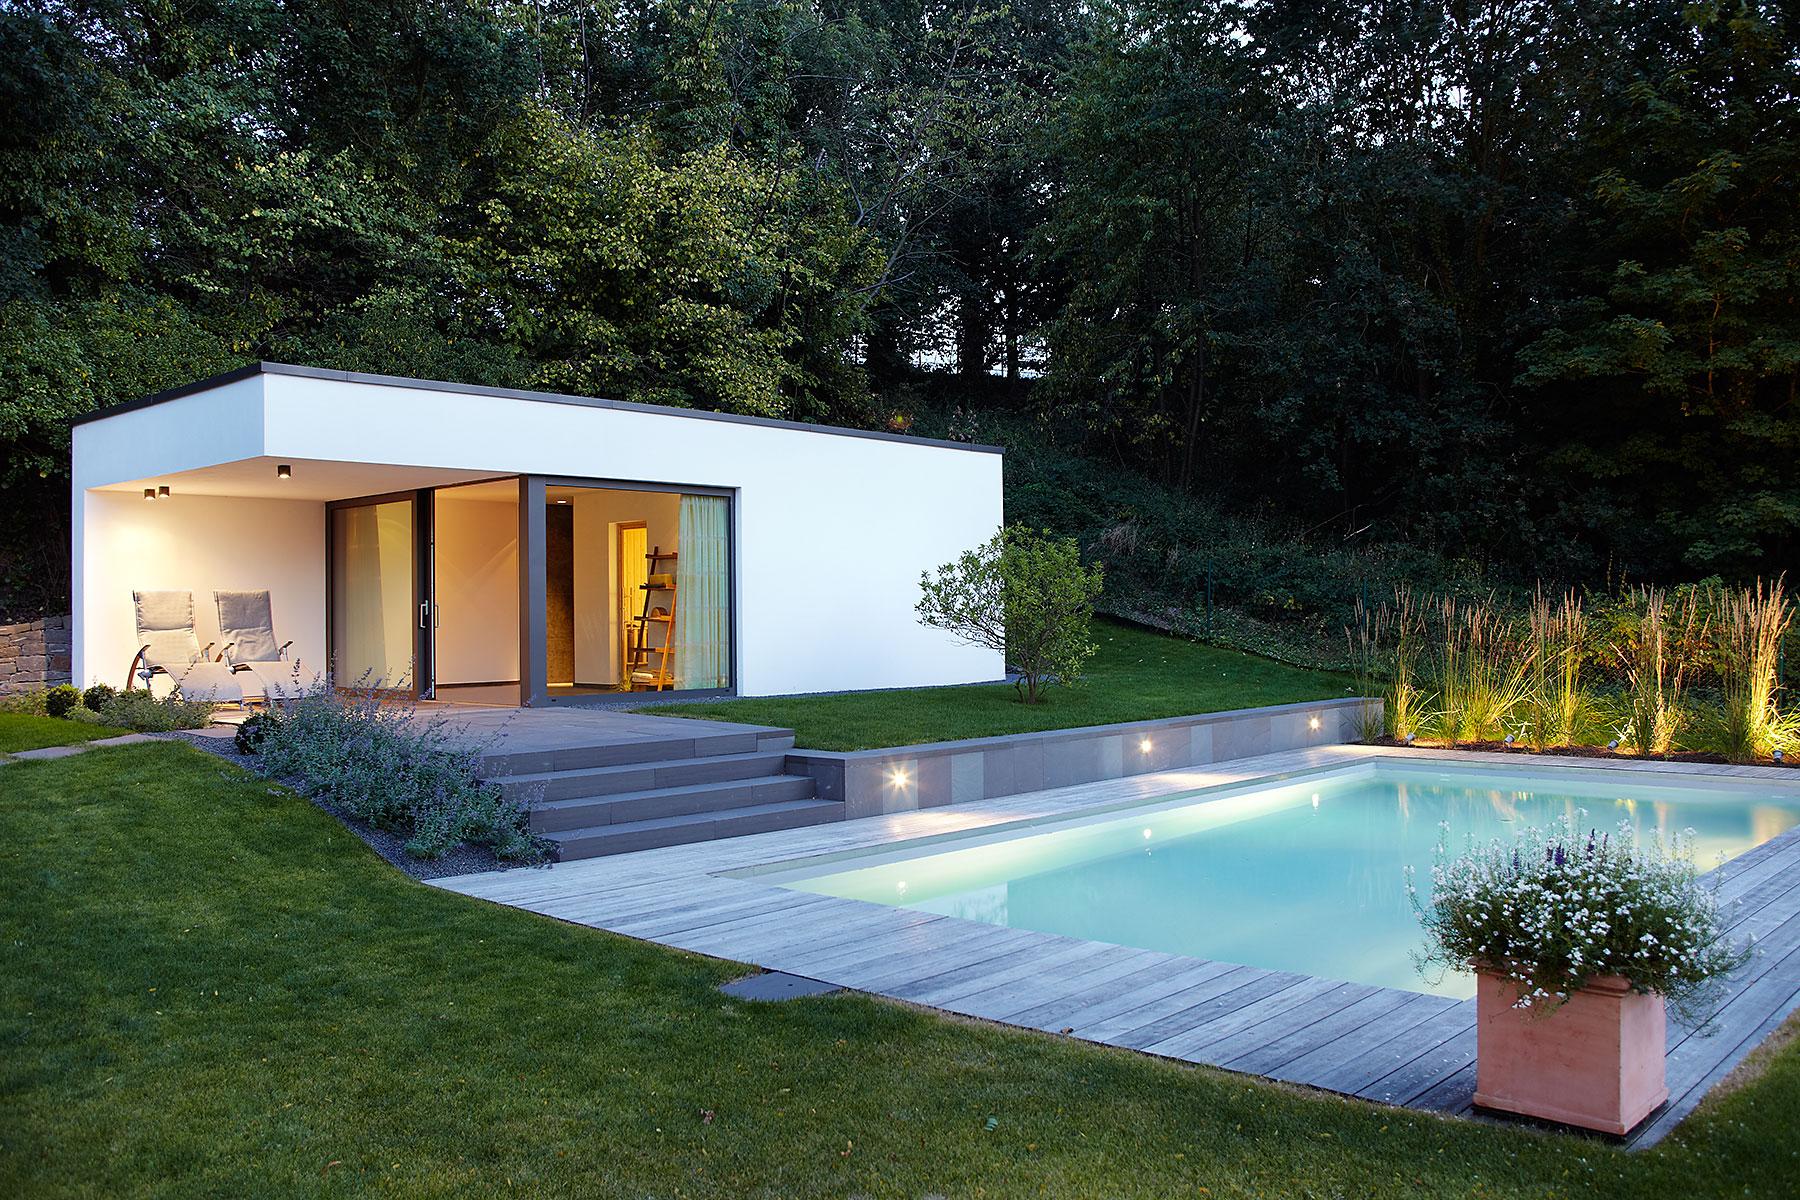 einfamilienhaus mit pool nicole zimmermann fotodesign. Black Bedroom Furniture Sets. Home Design Ideas